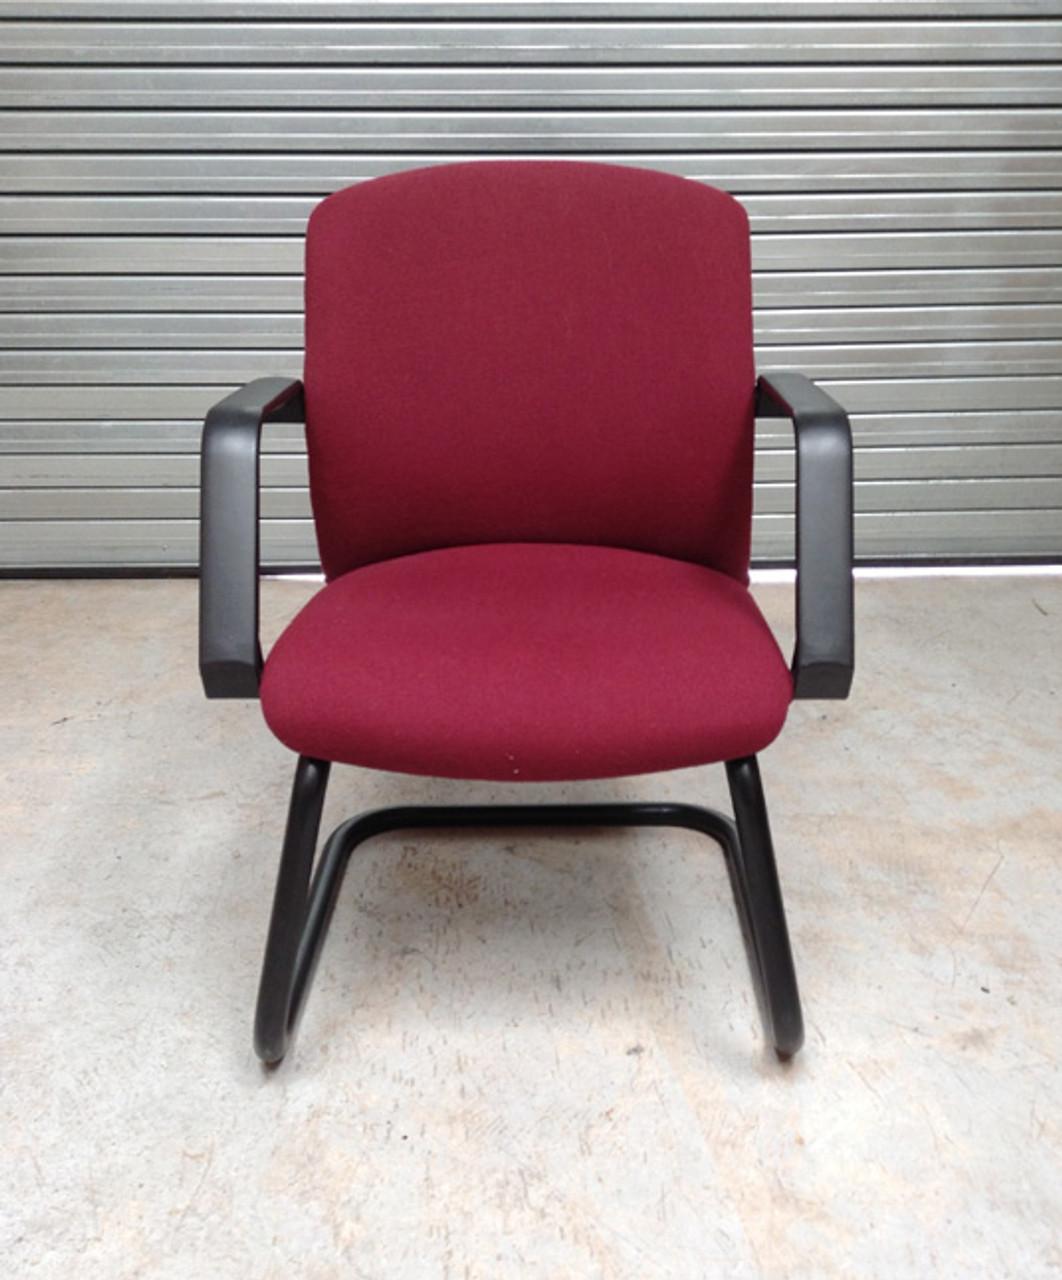 CC001 - Boardroom chair